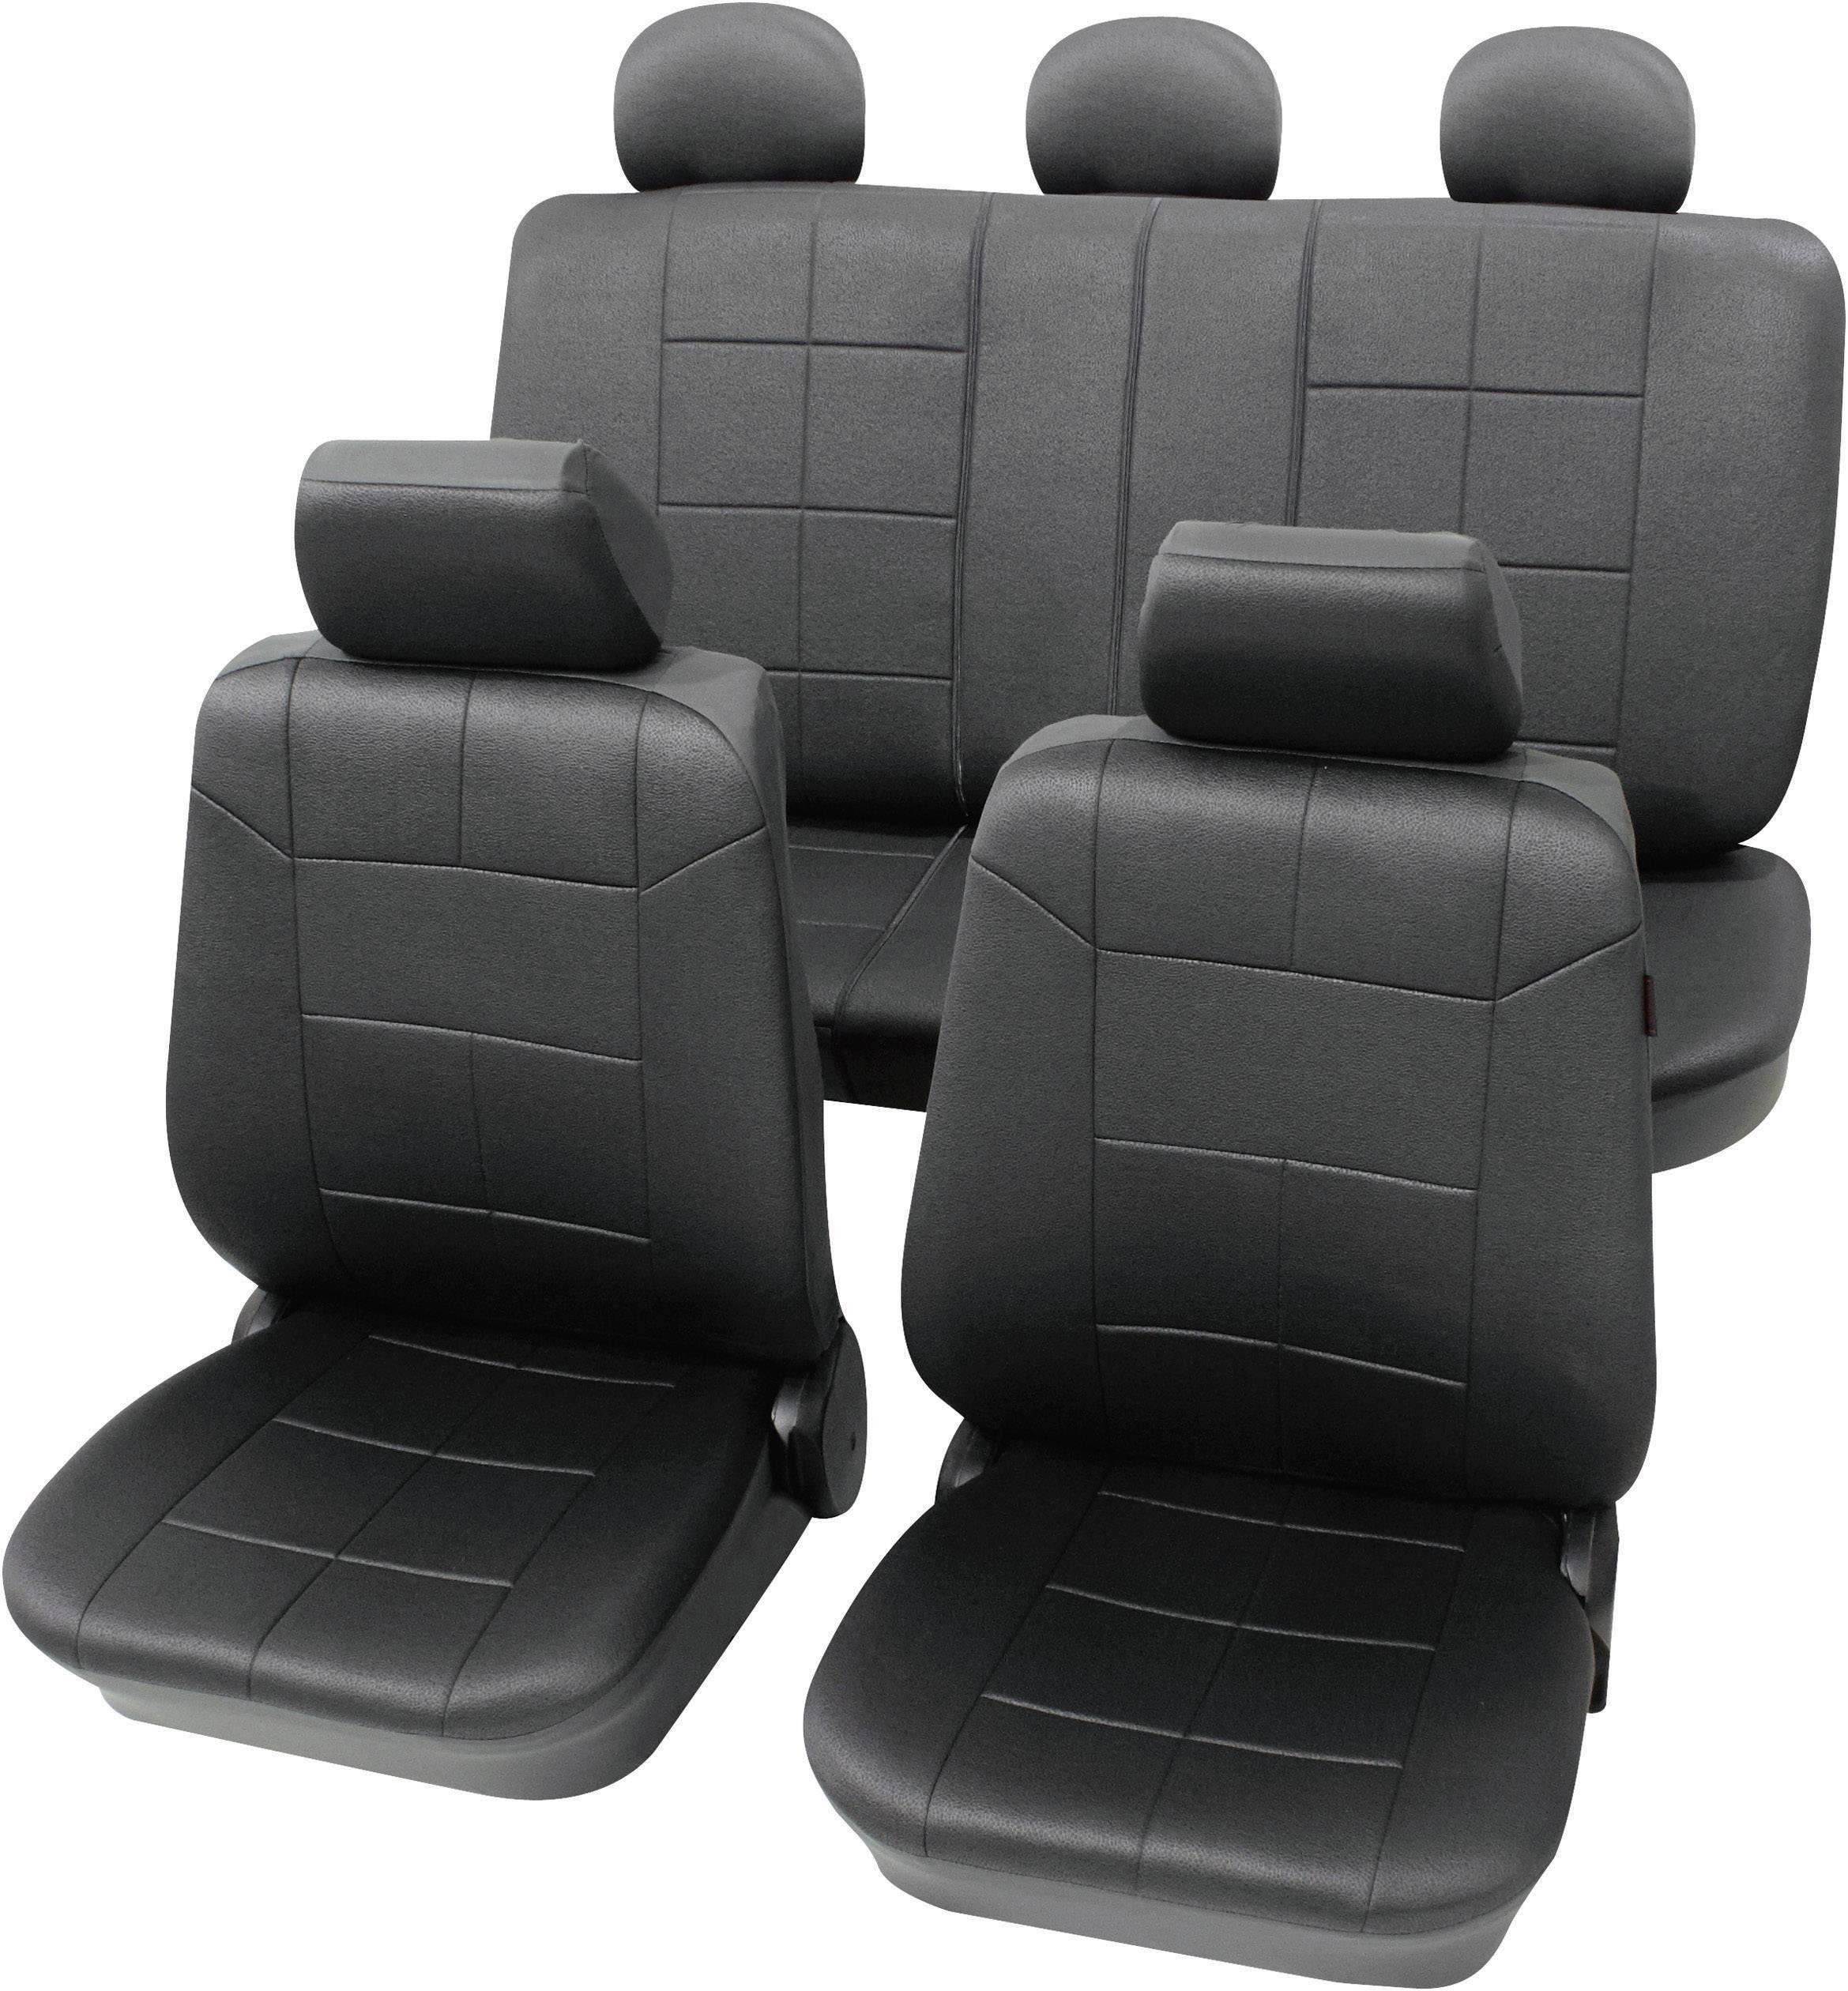 Autopotahy Petex Dakar SAB 1 Vario Plus 22574901, 17dílná, polyester, antracitová